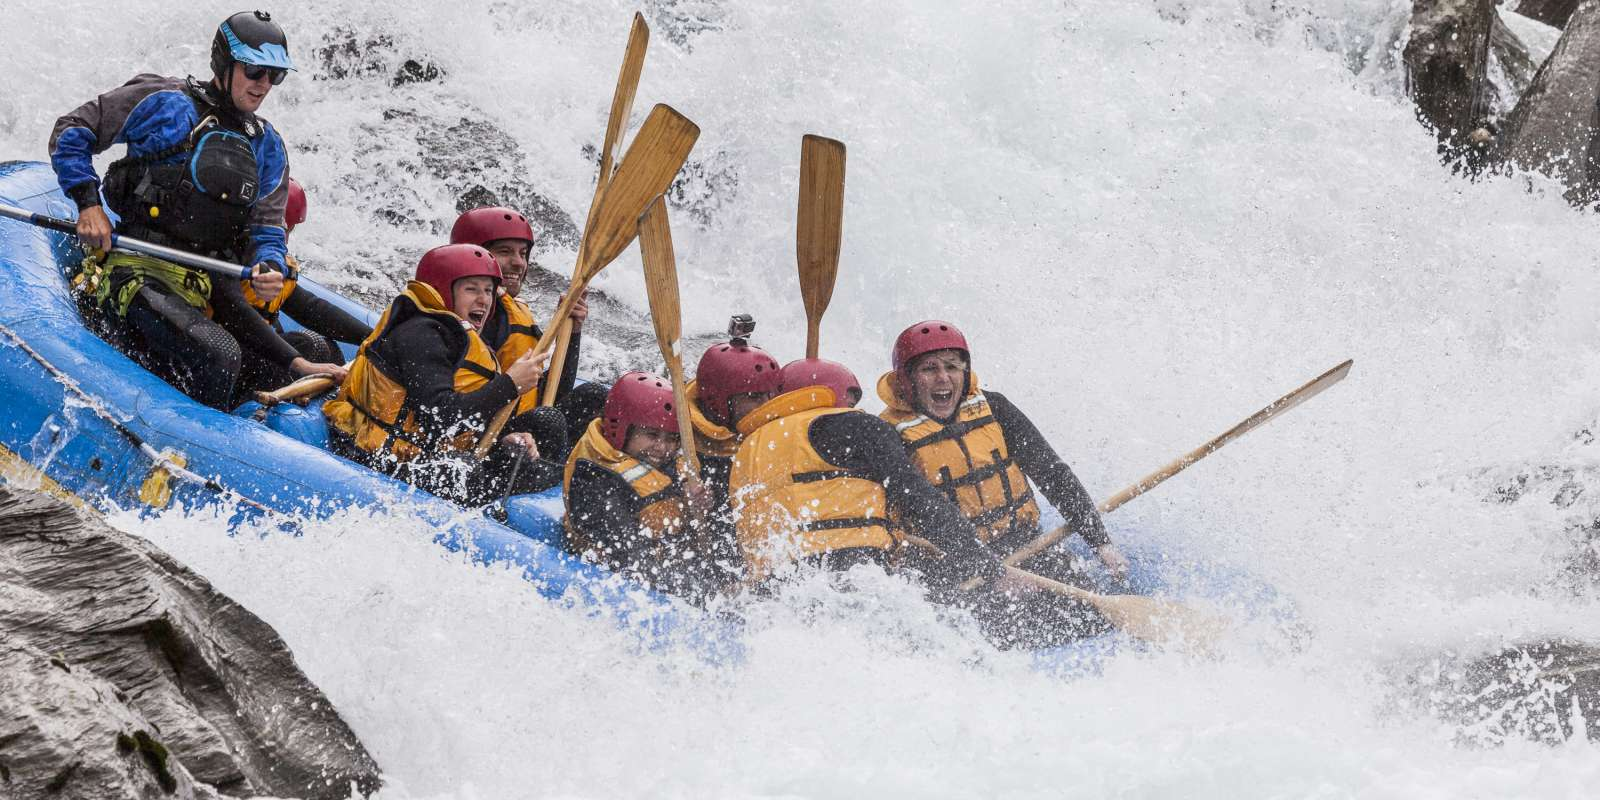 White water rafting on the Kawarau River